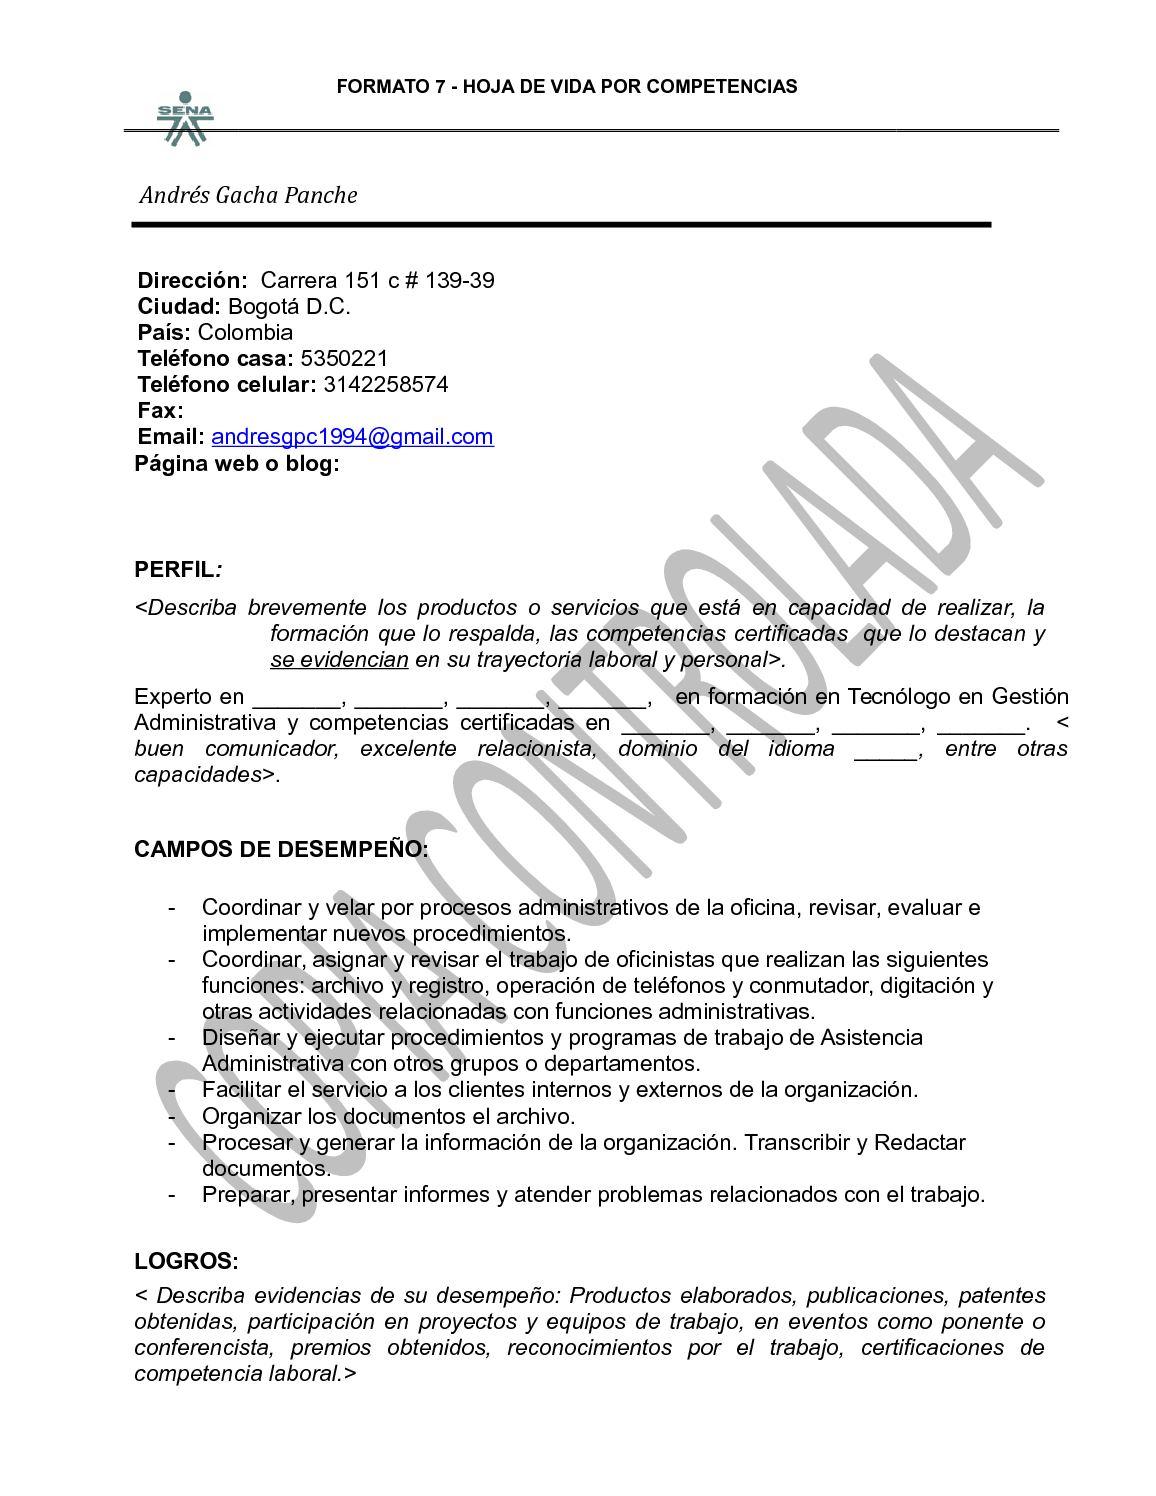 formato de reconocimientos - Vatoz.atozdevelopment.co